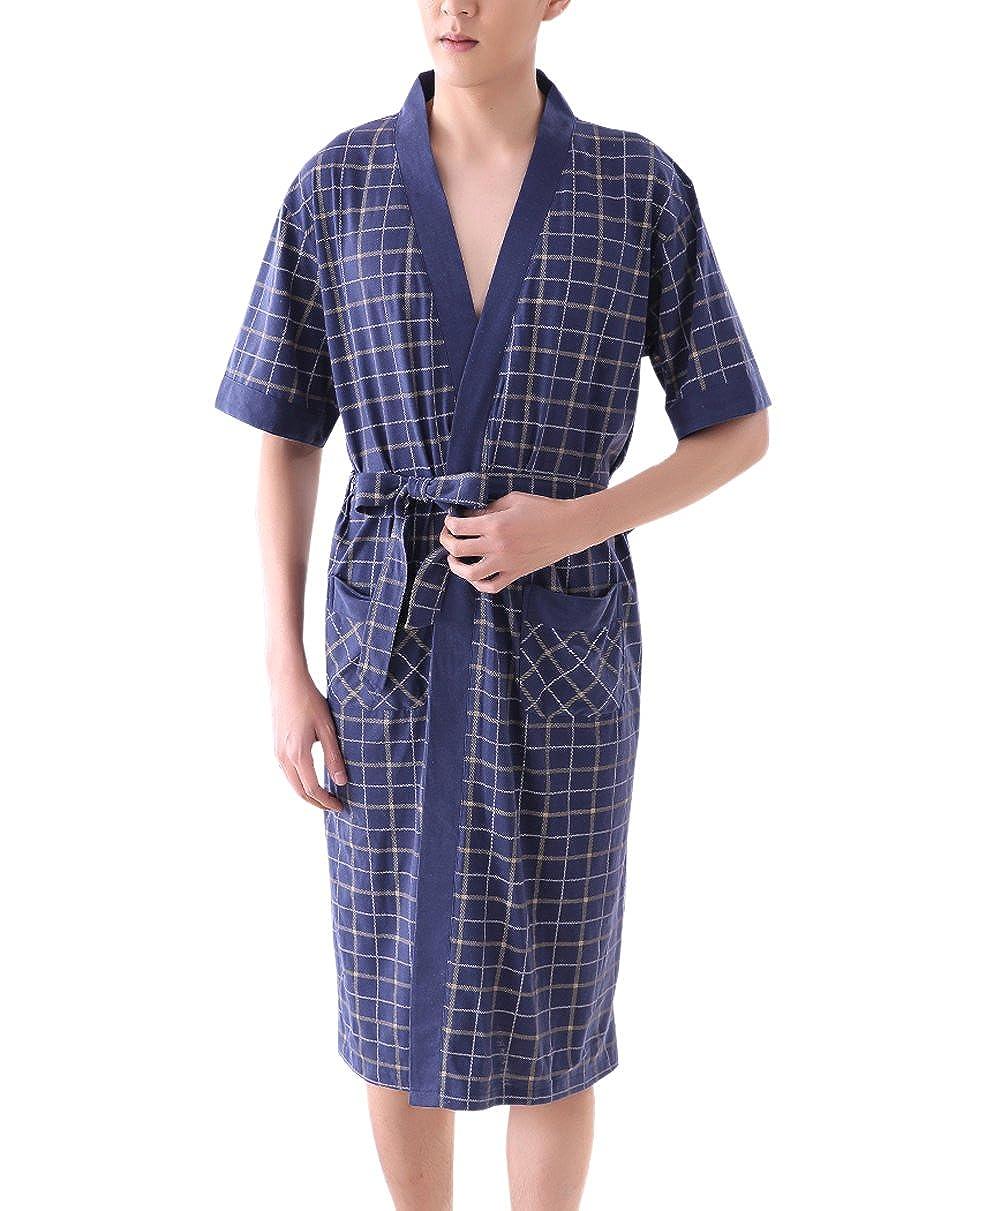 TRENDY XU Men's Sleepwear Summer Short-Sleeved Loose Cotton Bathrobes Grid Pattern